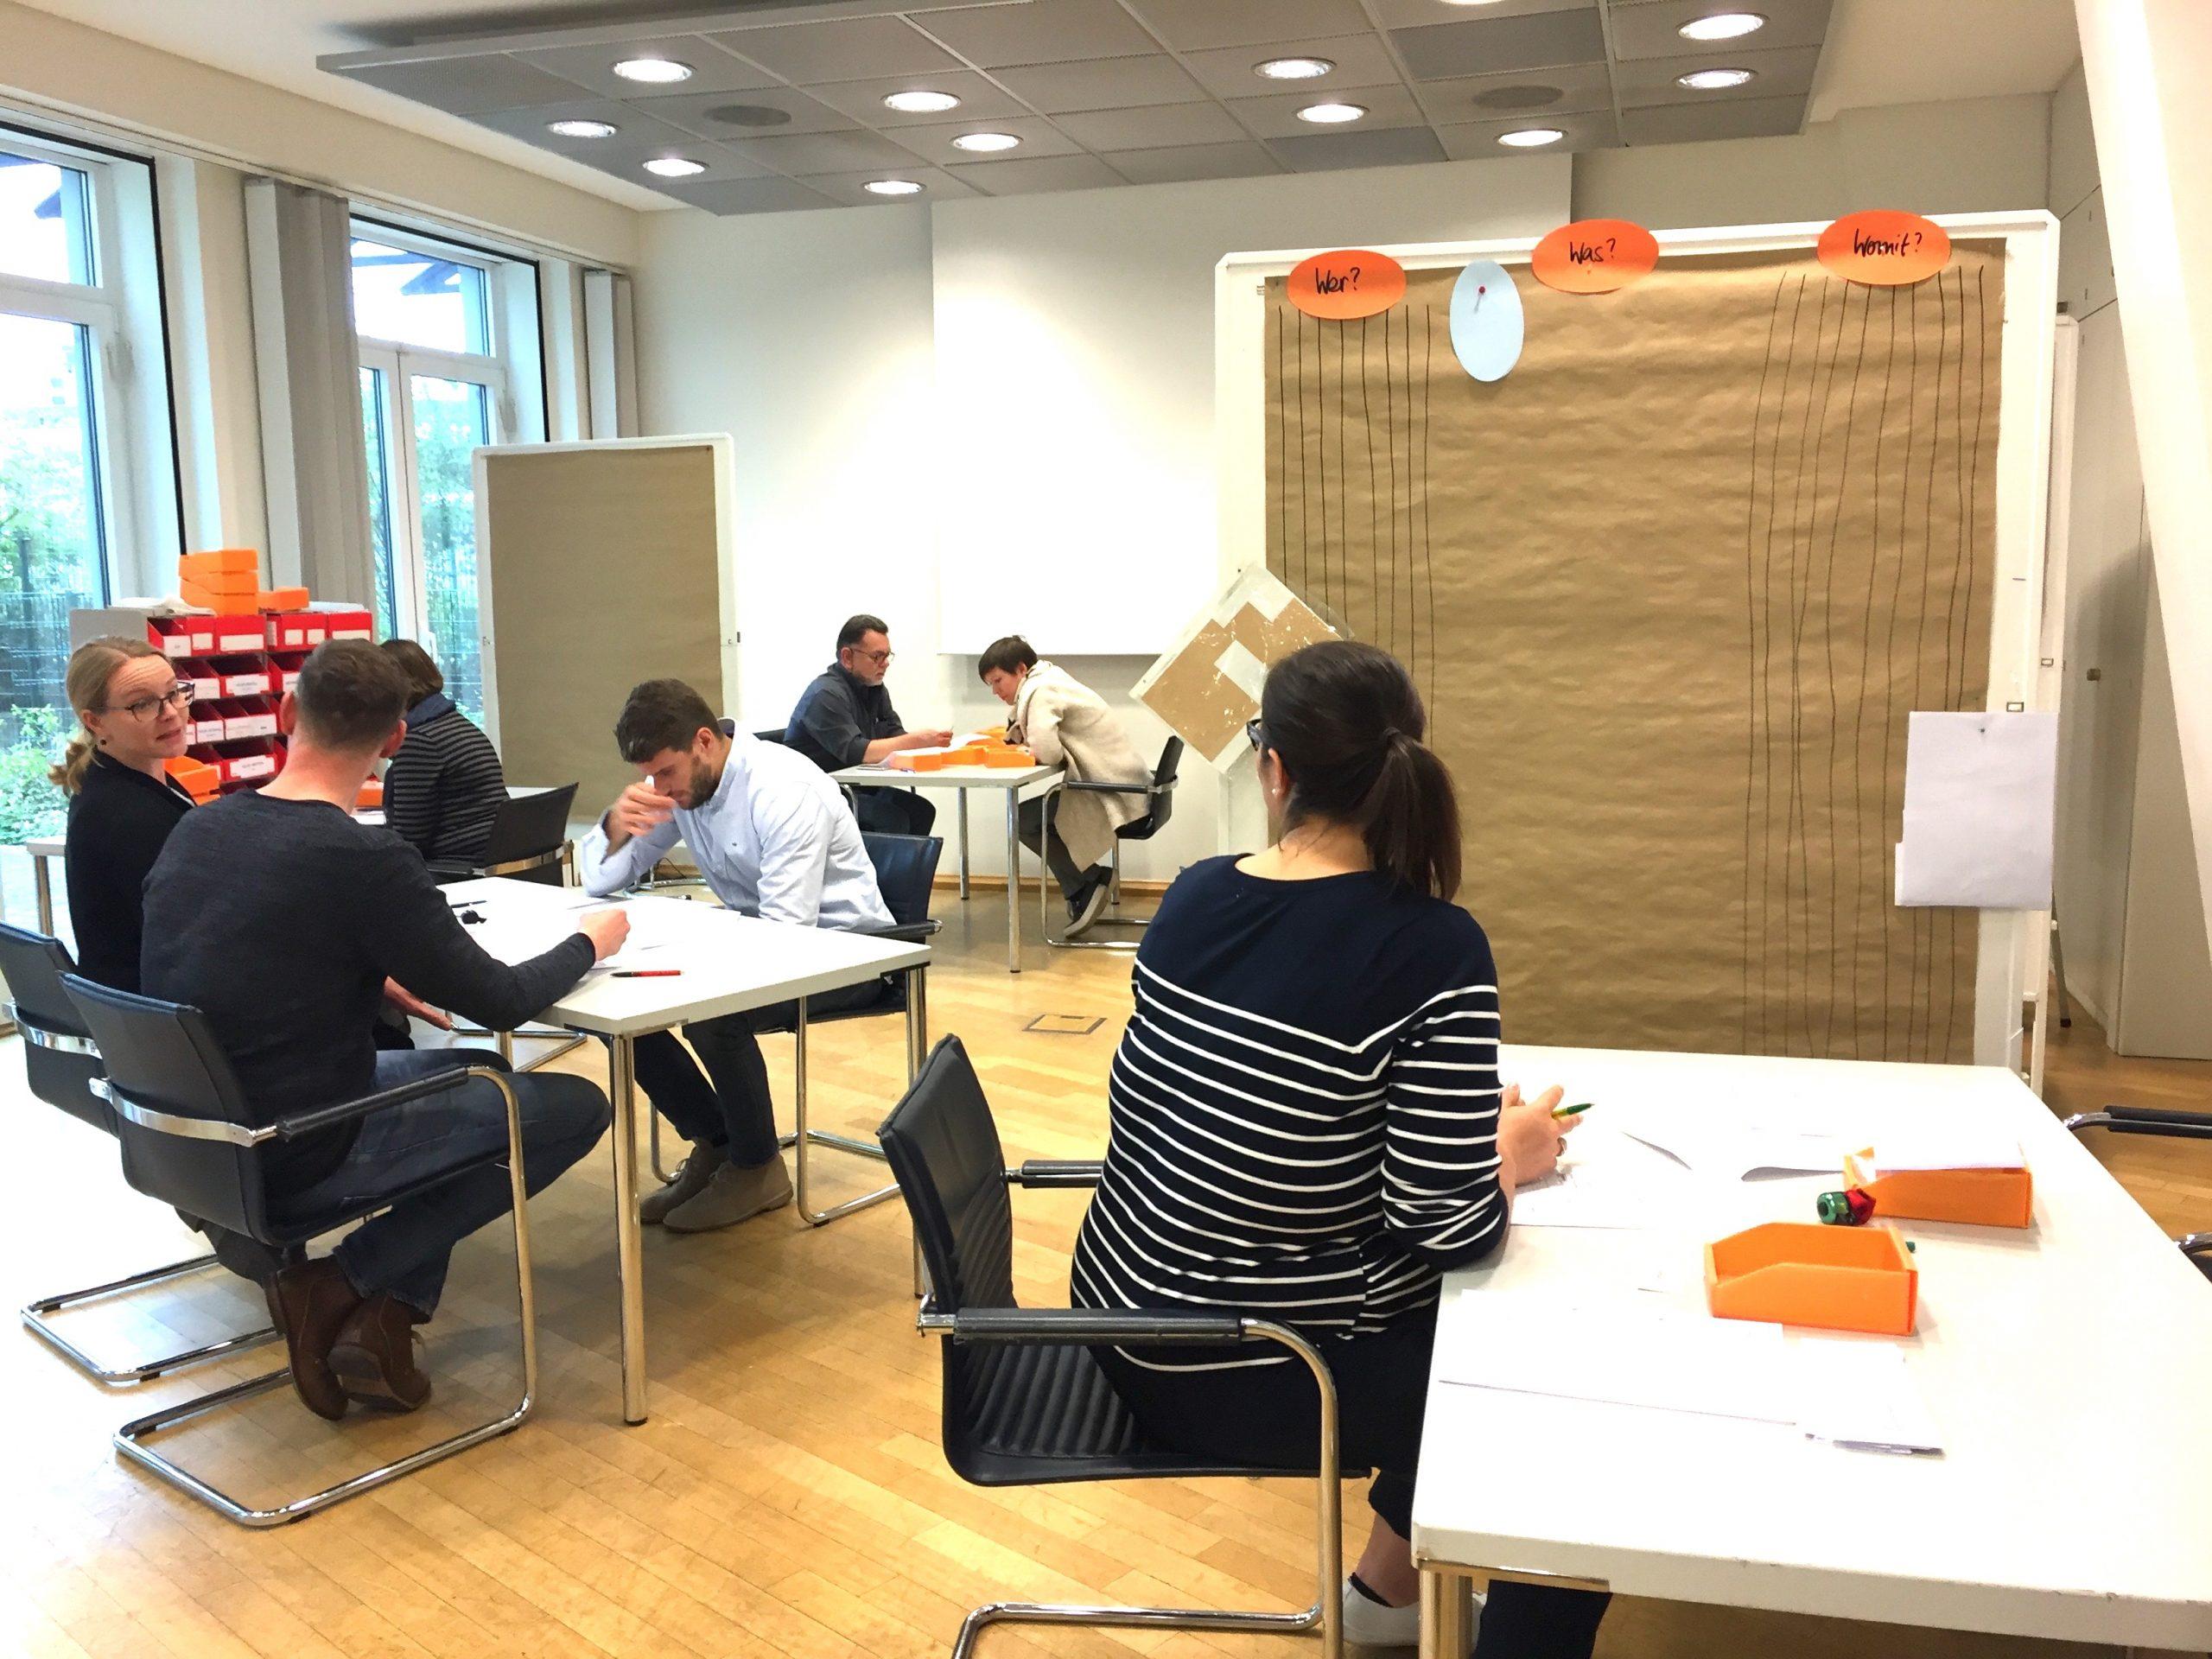 Training - Agiles Prozessmanagement, Claudia Kostka